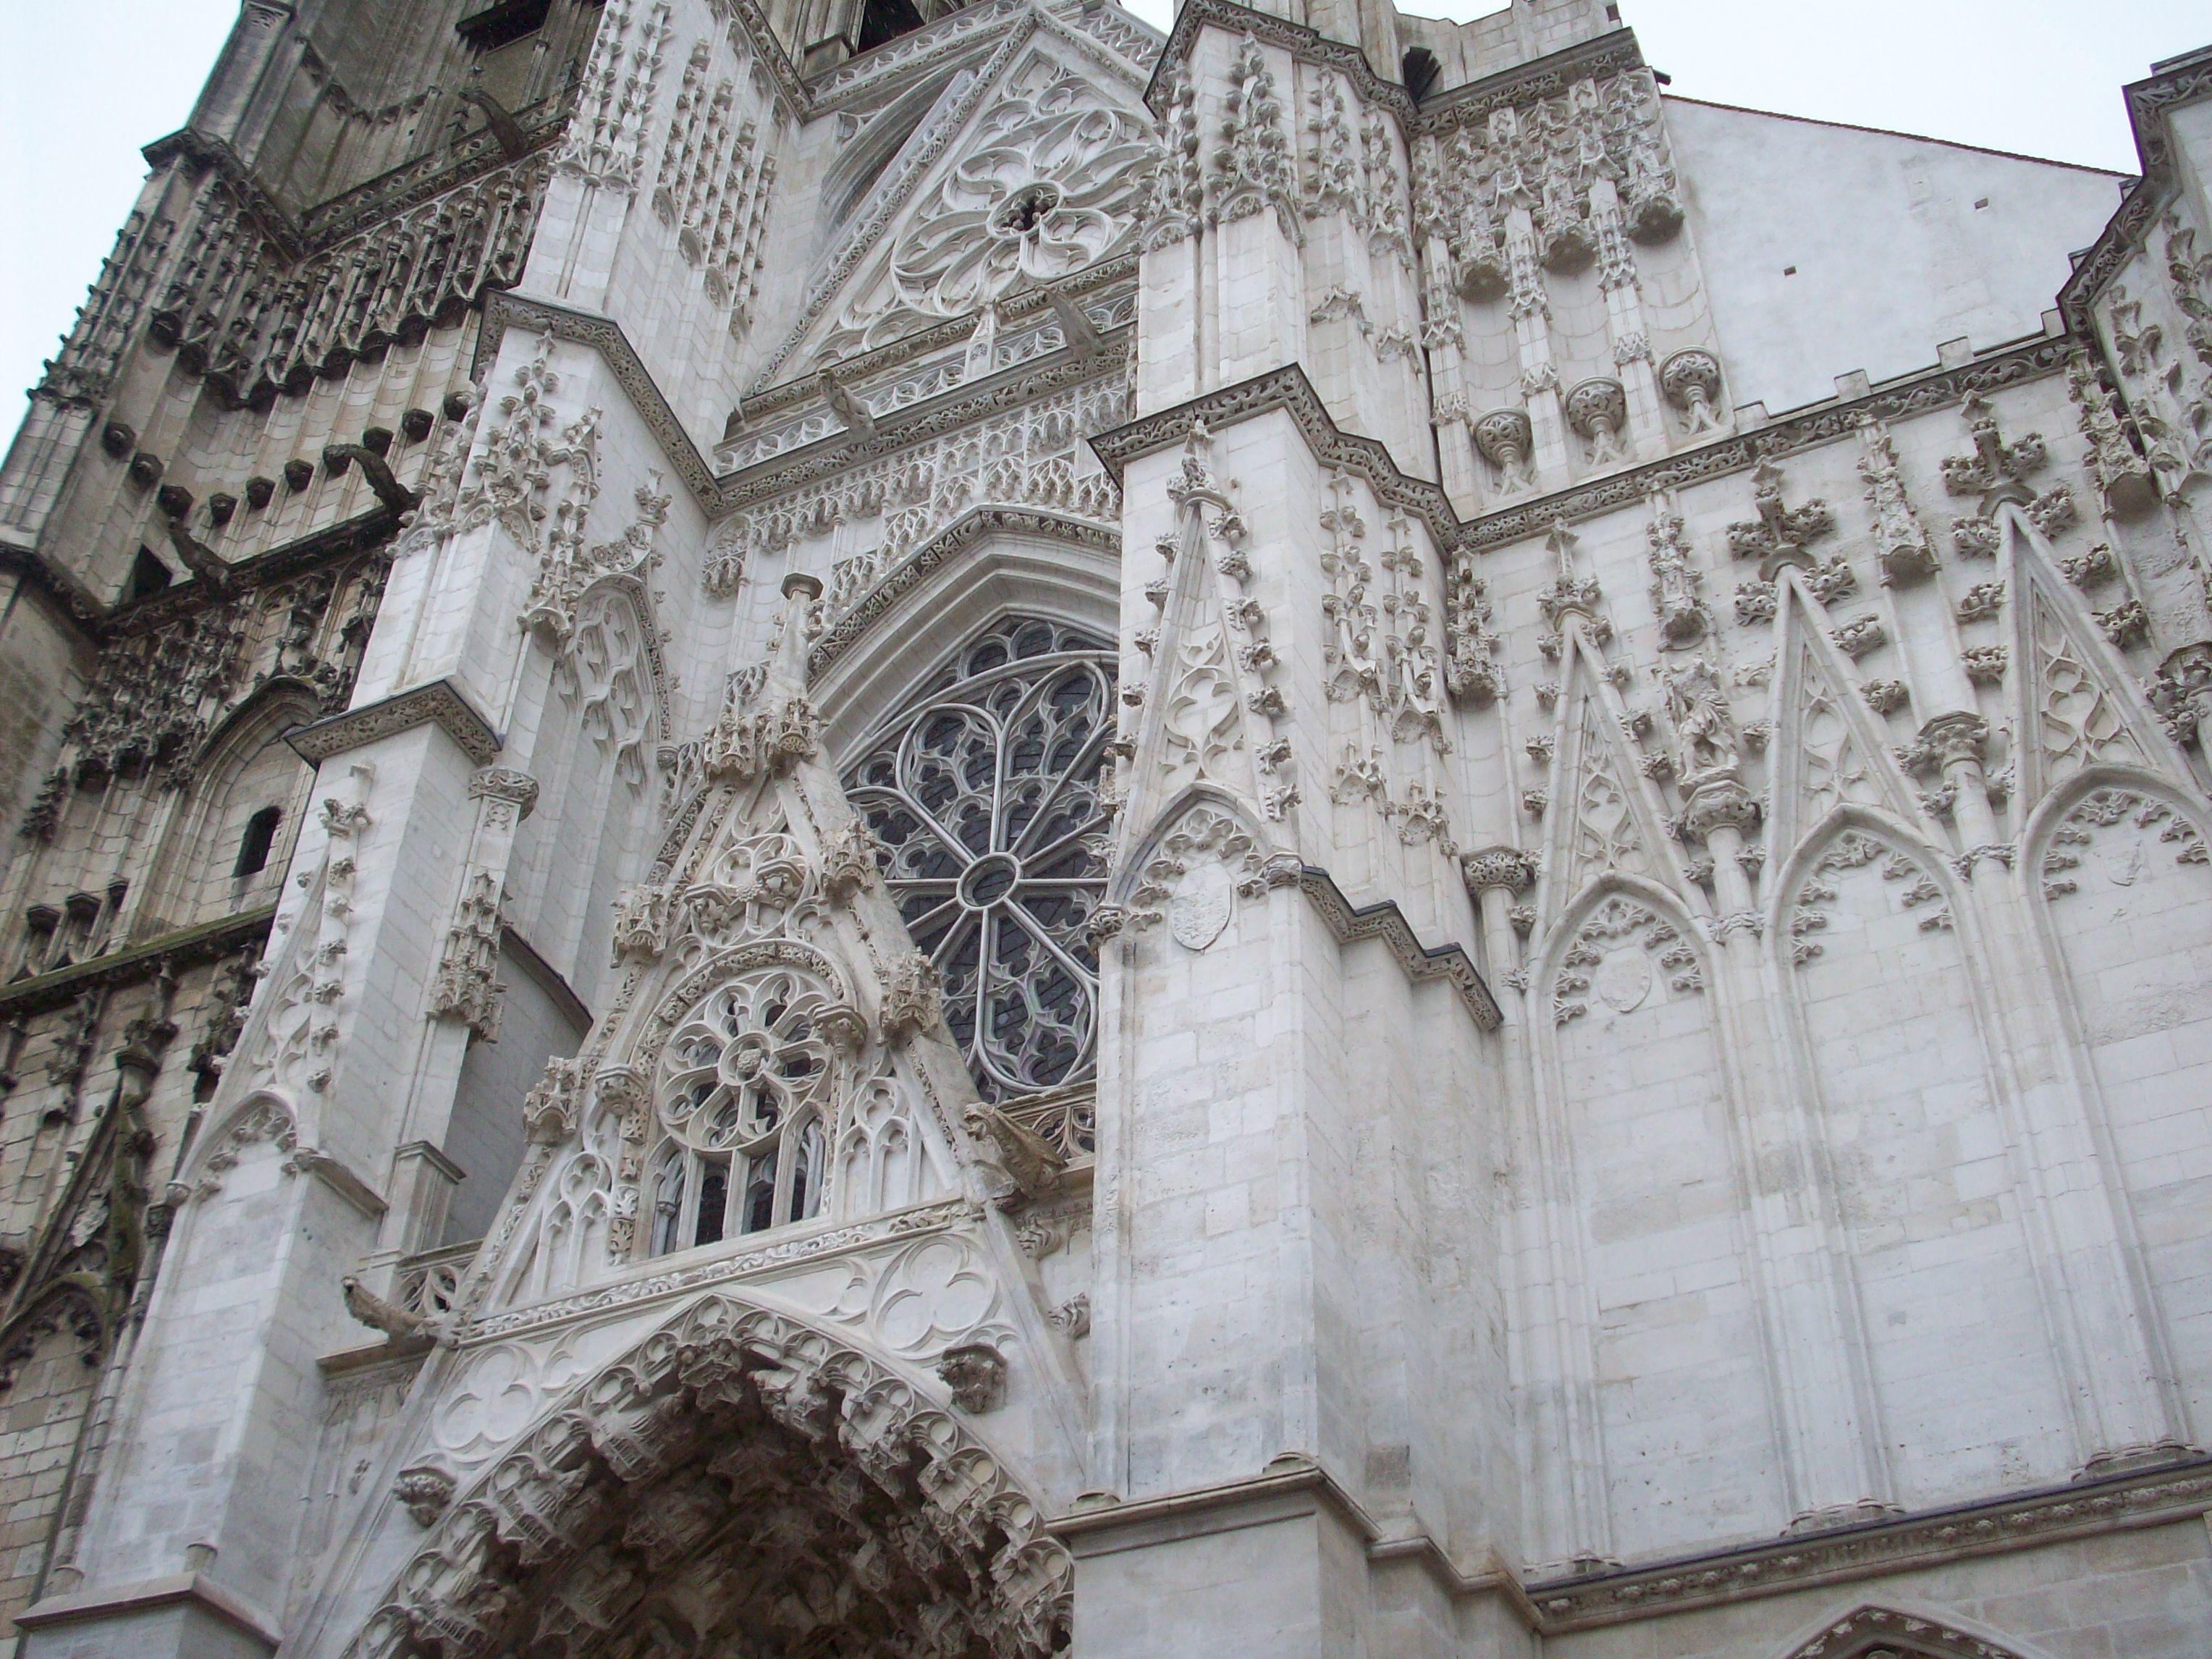 cathedrale-saint-germain